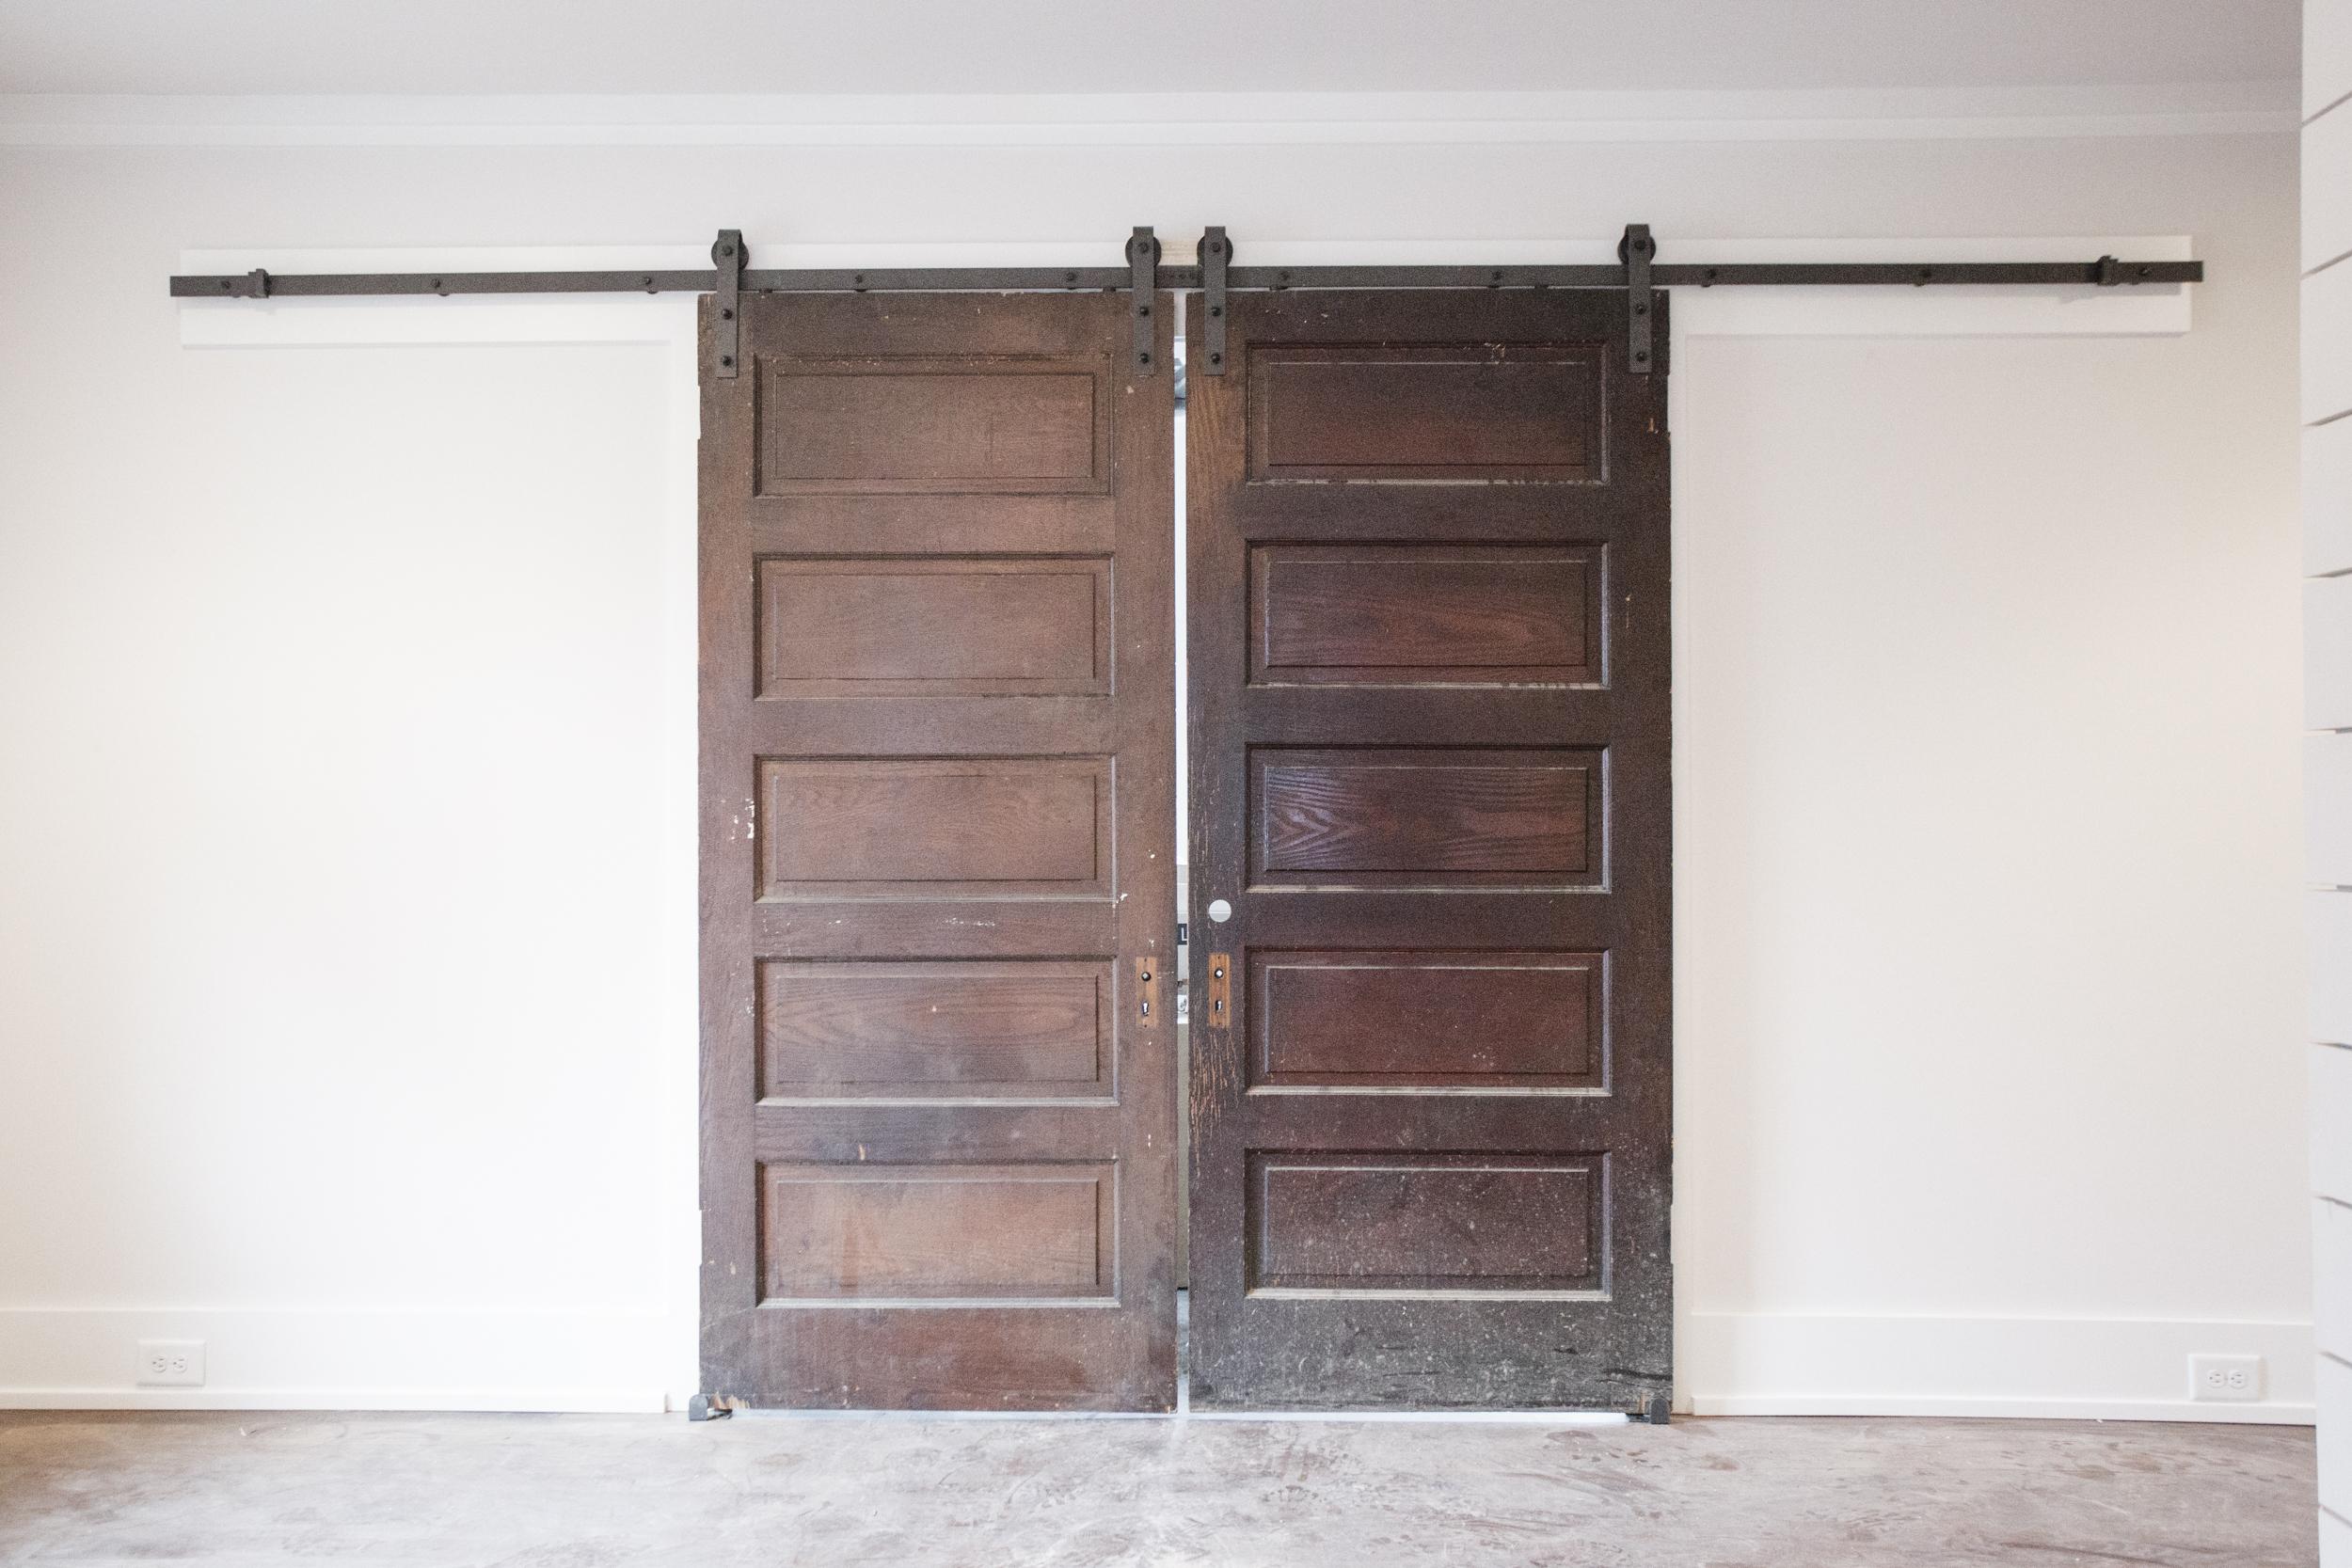 britt-development-group-nashville-tennessee-custom-home-builder-historic-restoration-0797.jpg